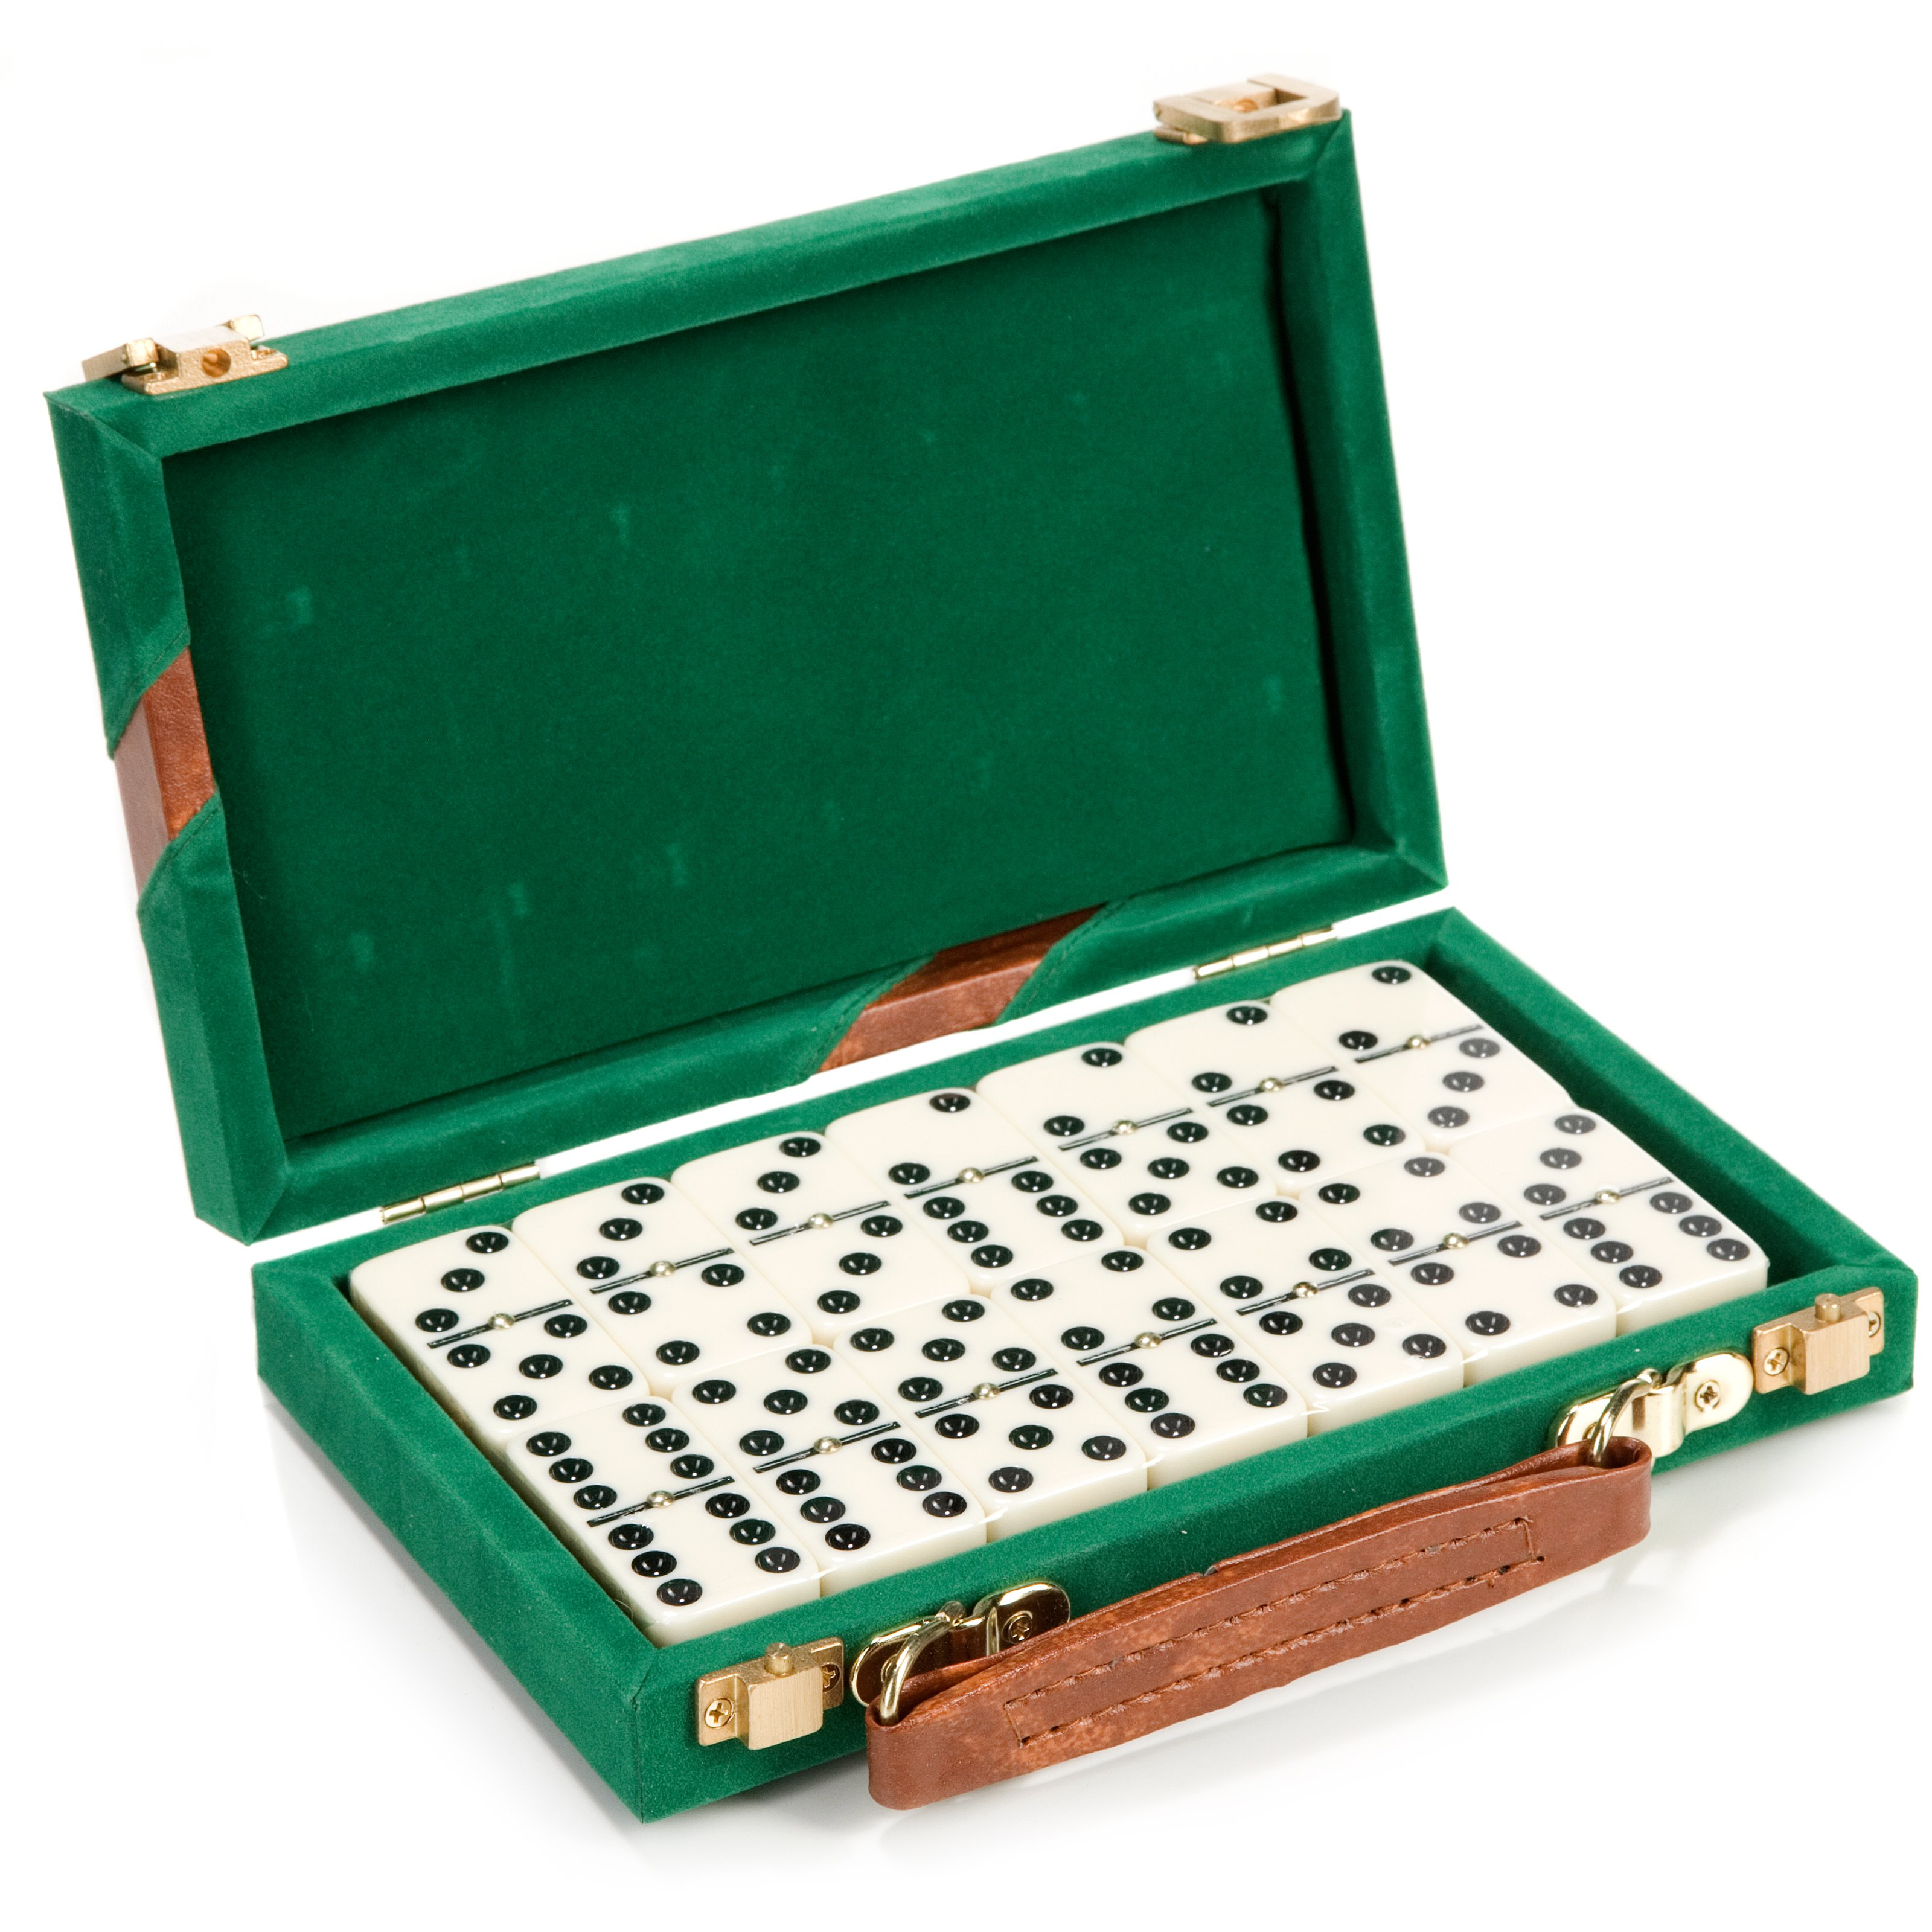 Cambor Domino Set